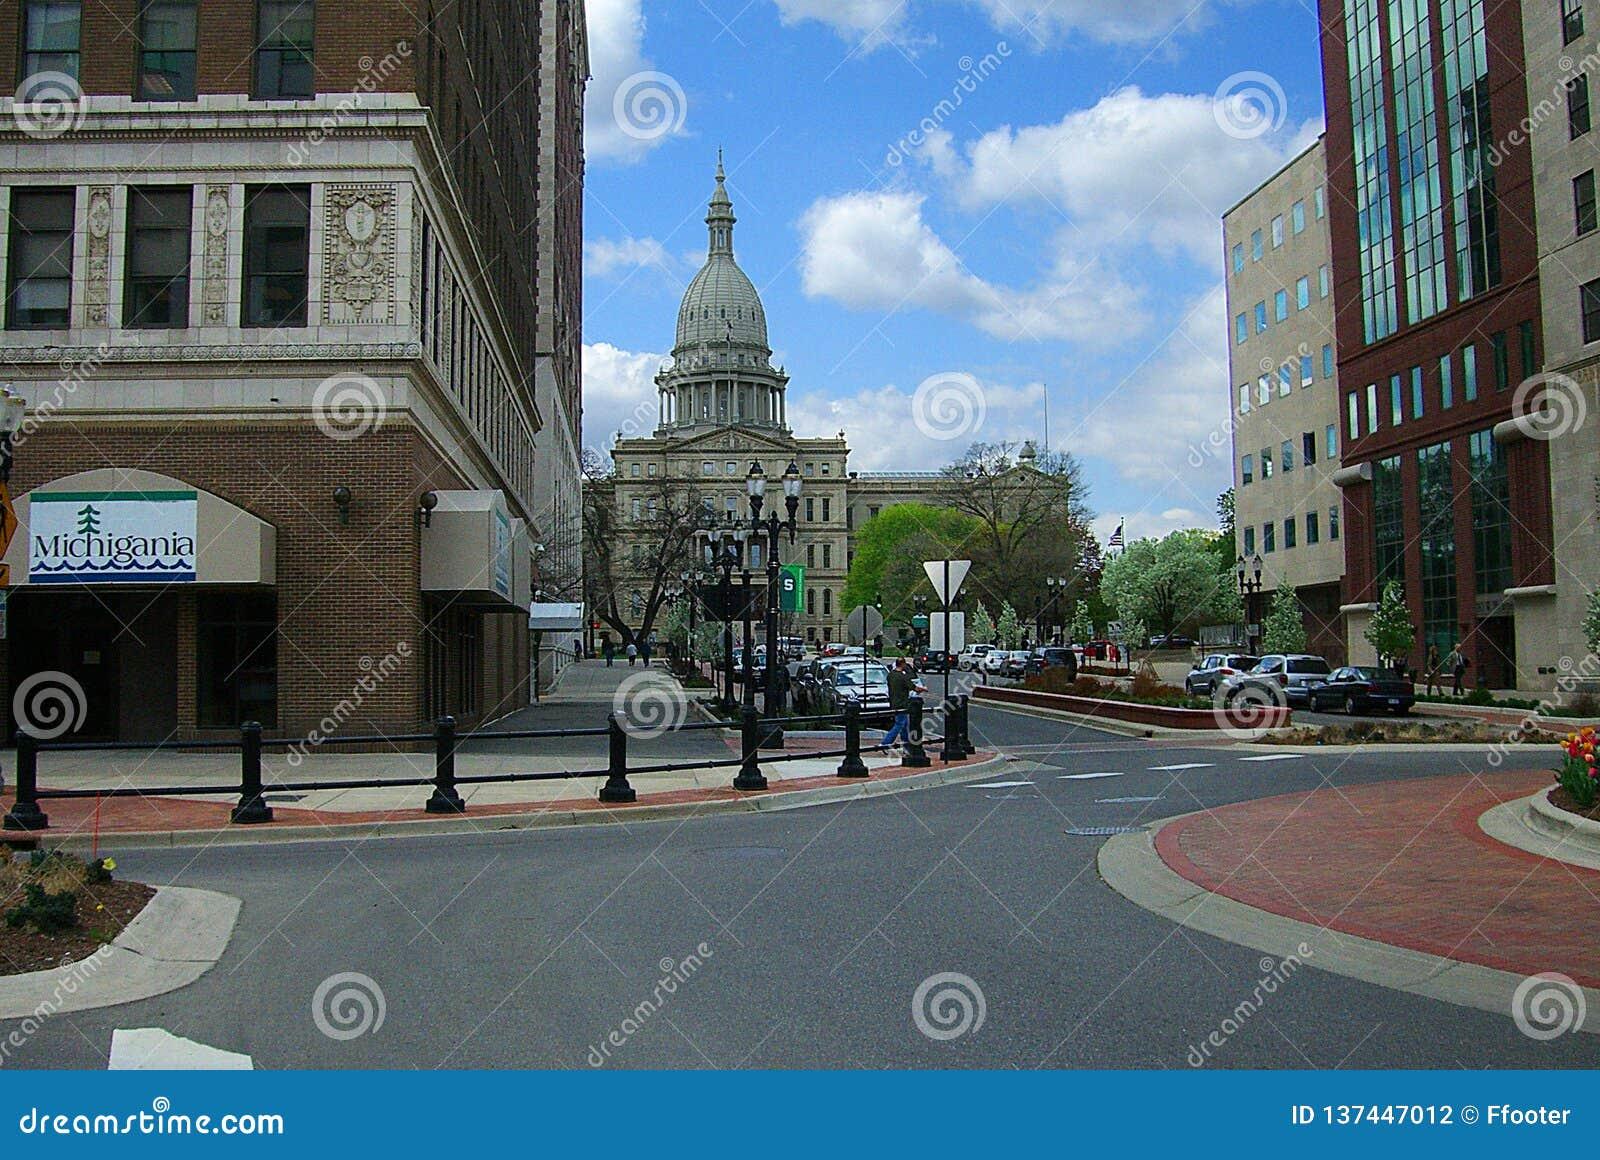 Lansing, Michigan mit Zustands-Kapitol-Gebäude